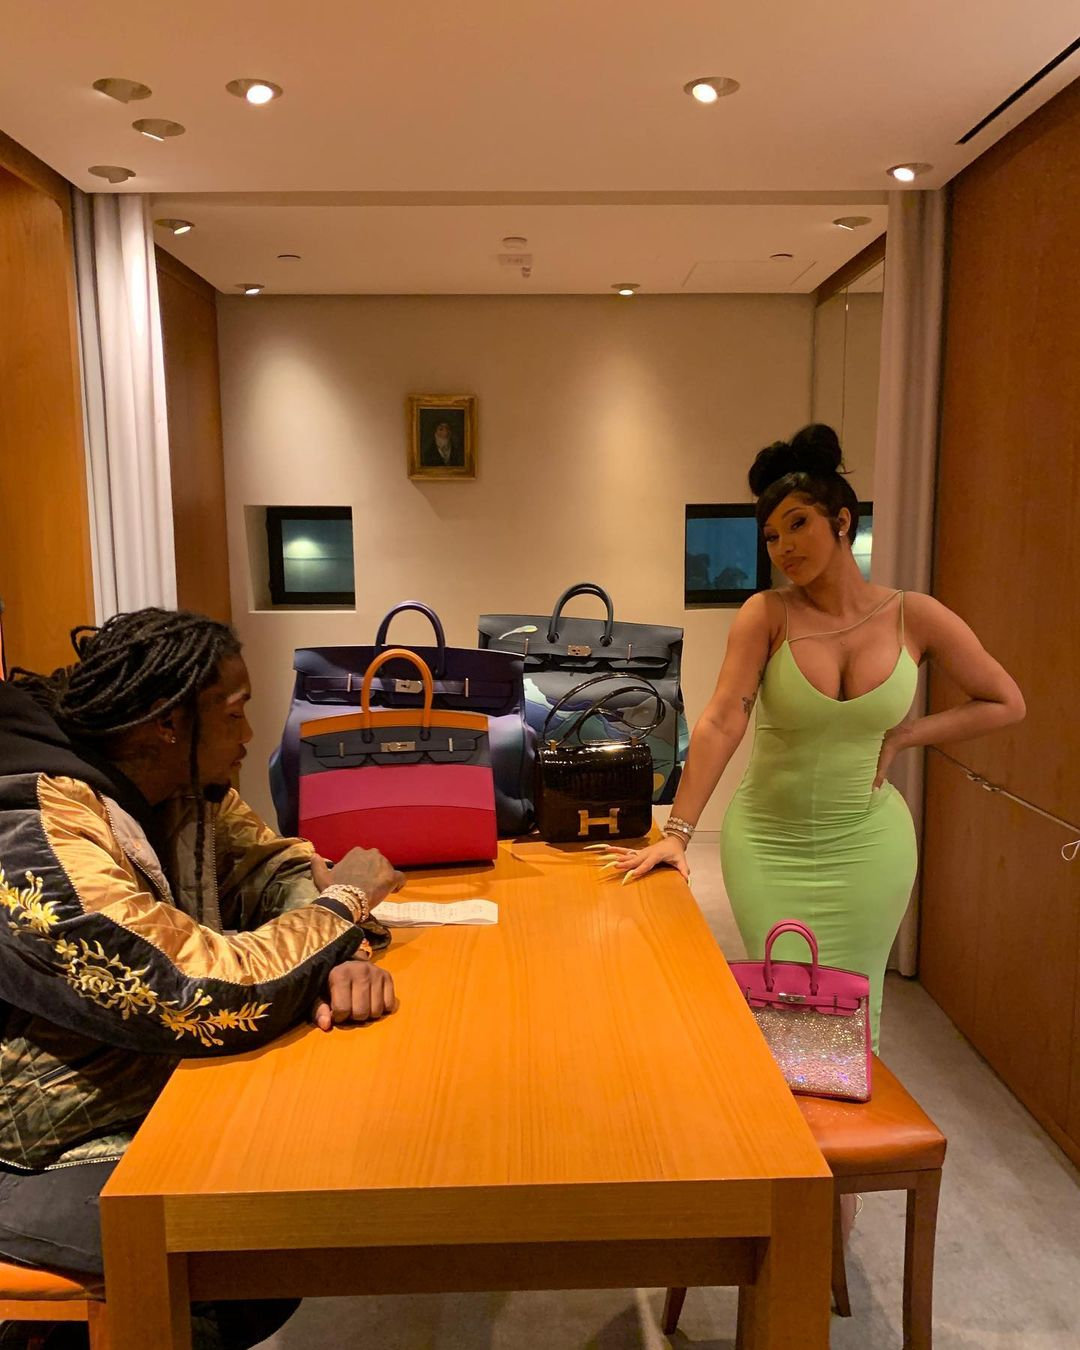 celebrity divorces and splits that shocked us in 2020